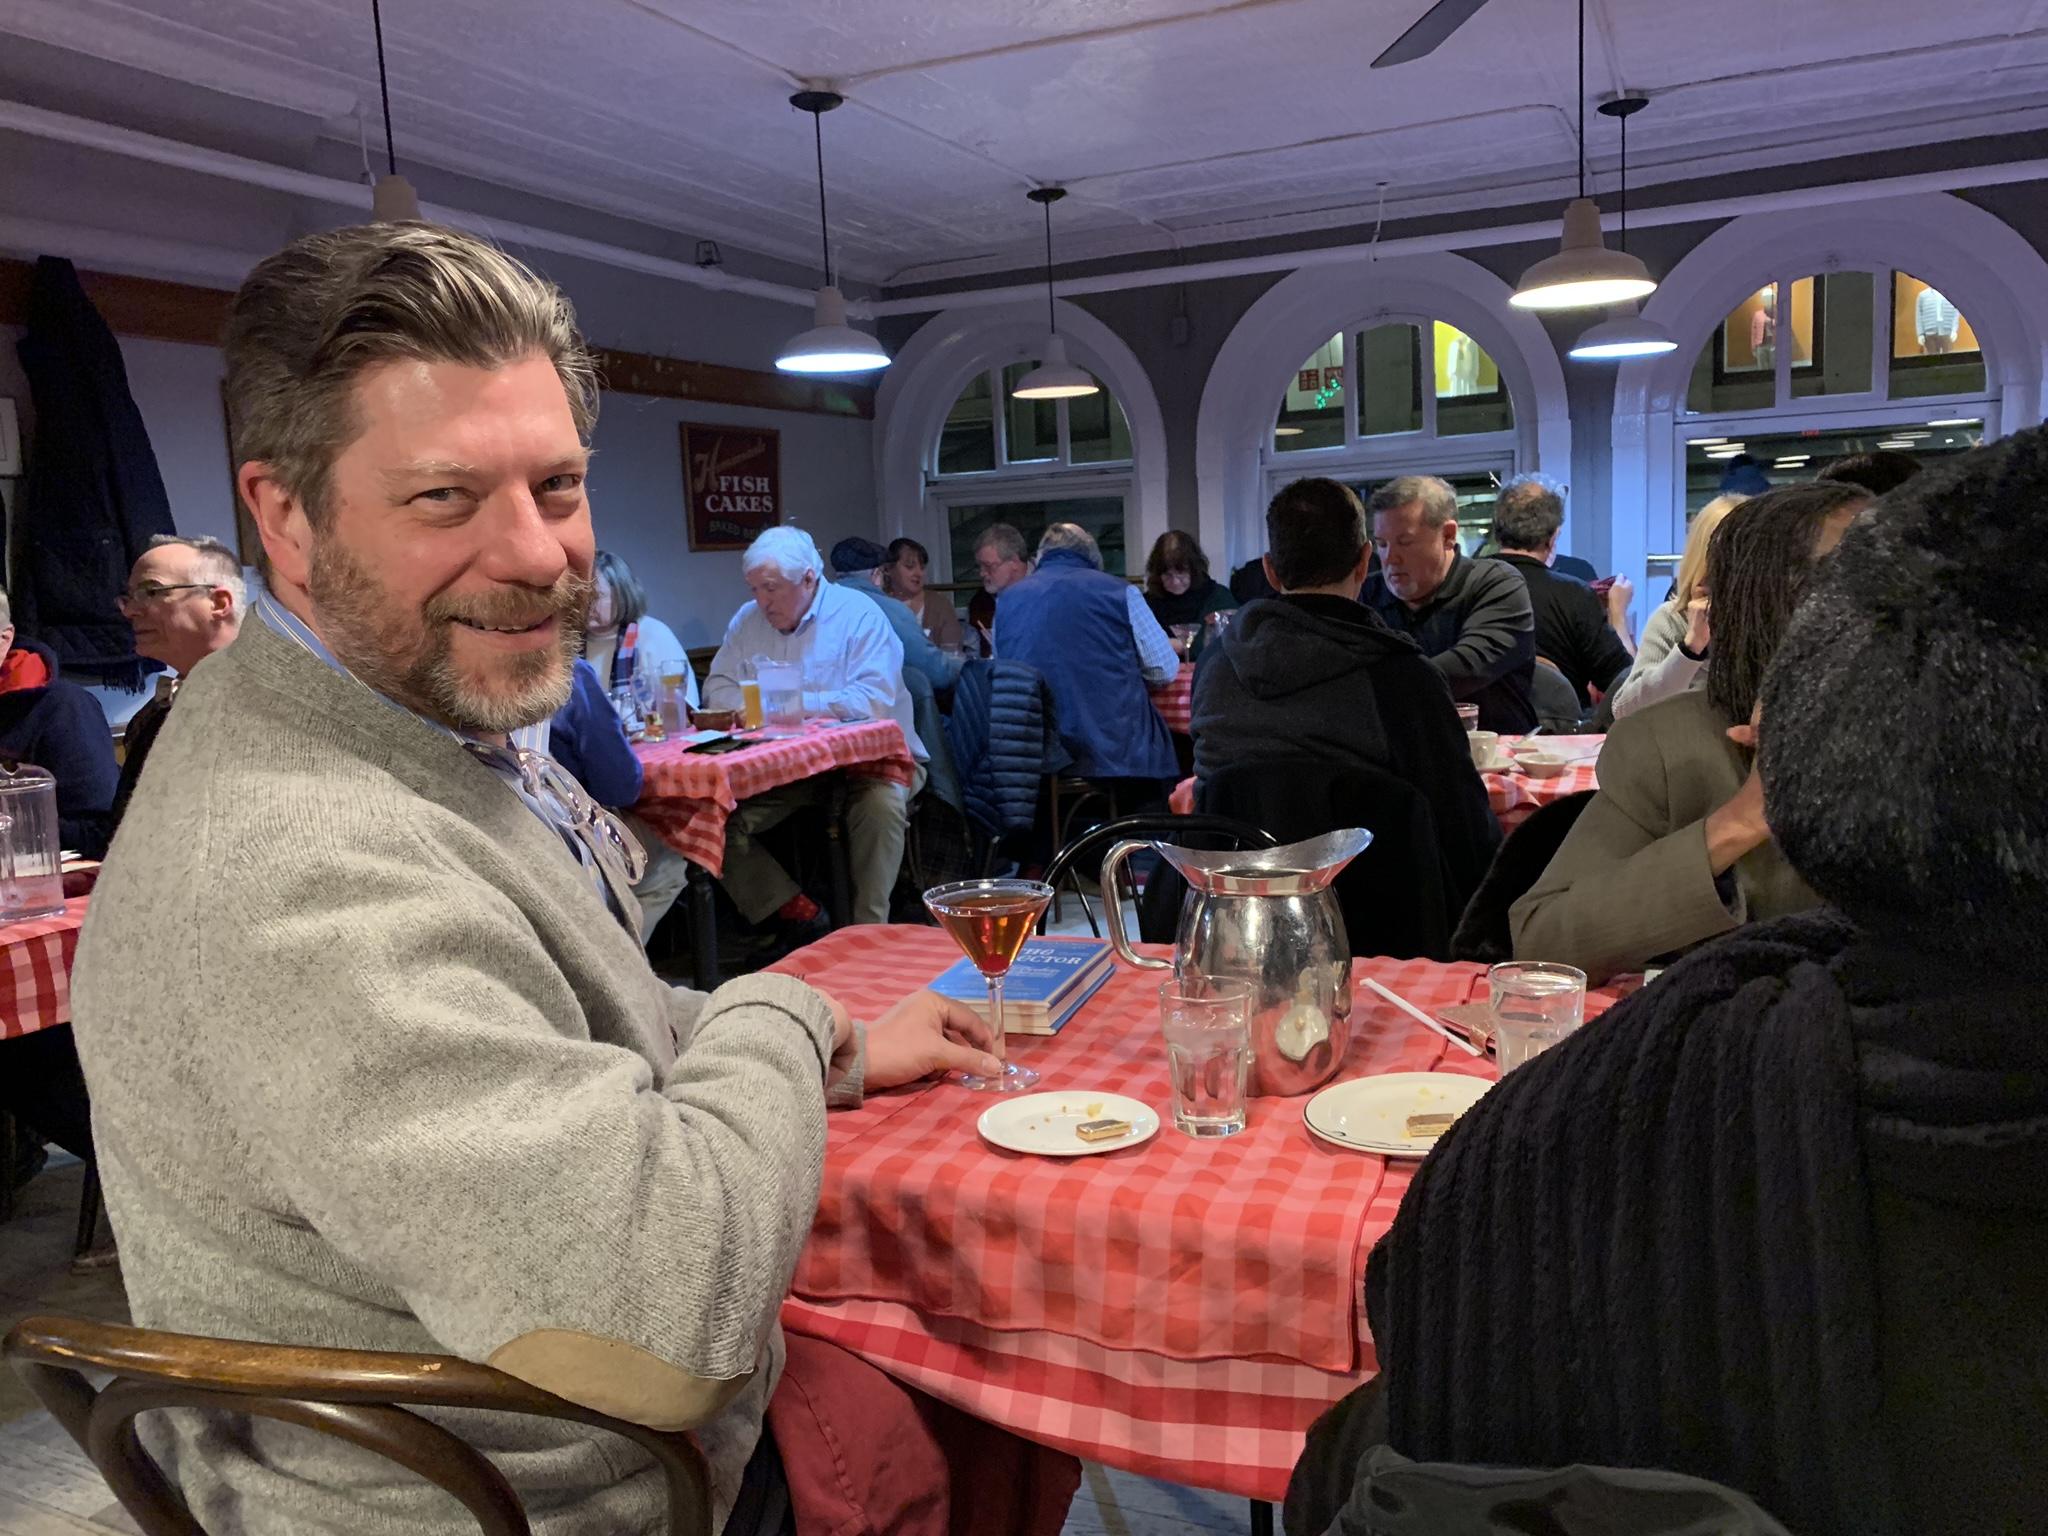 Etiquetteer enjoying one last dinner at Durgin-Park.